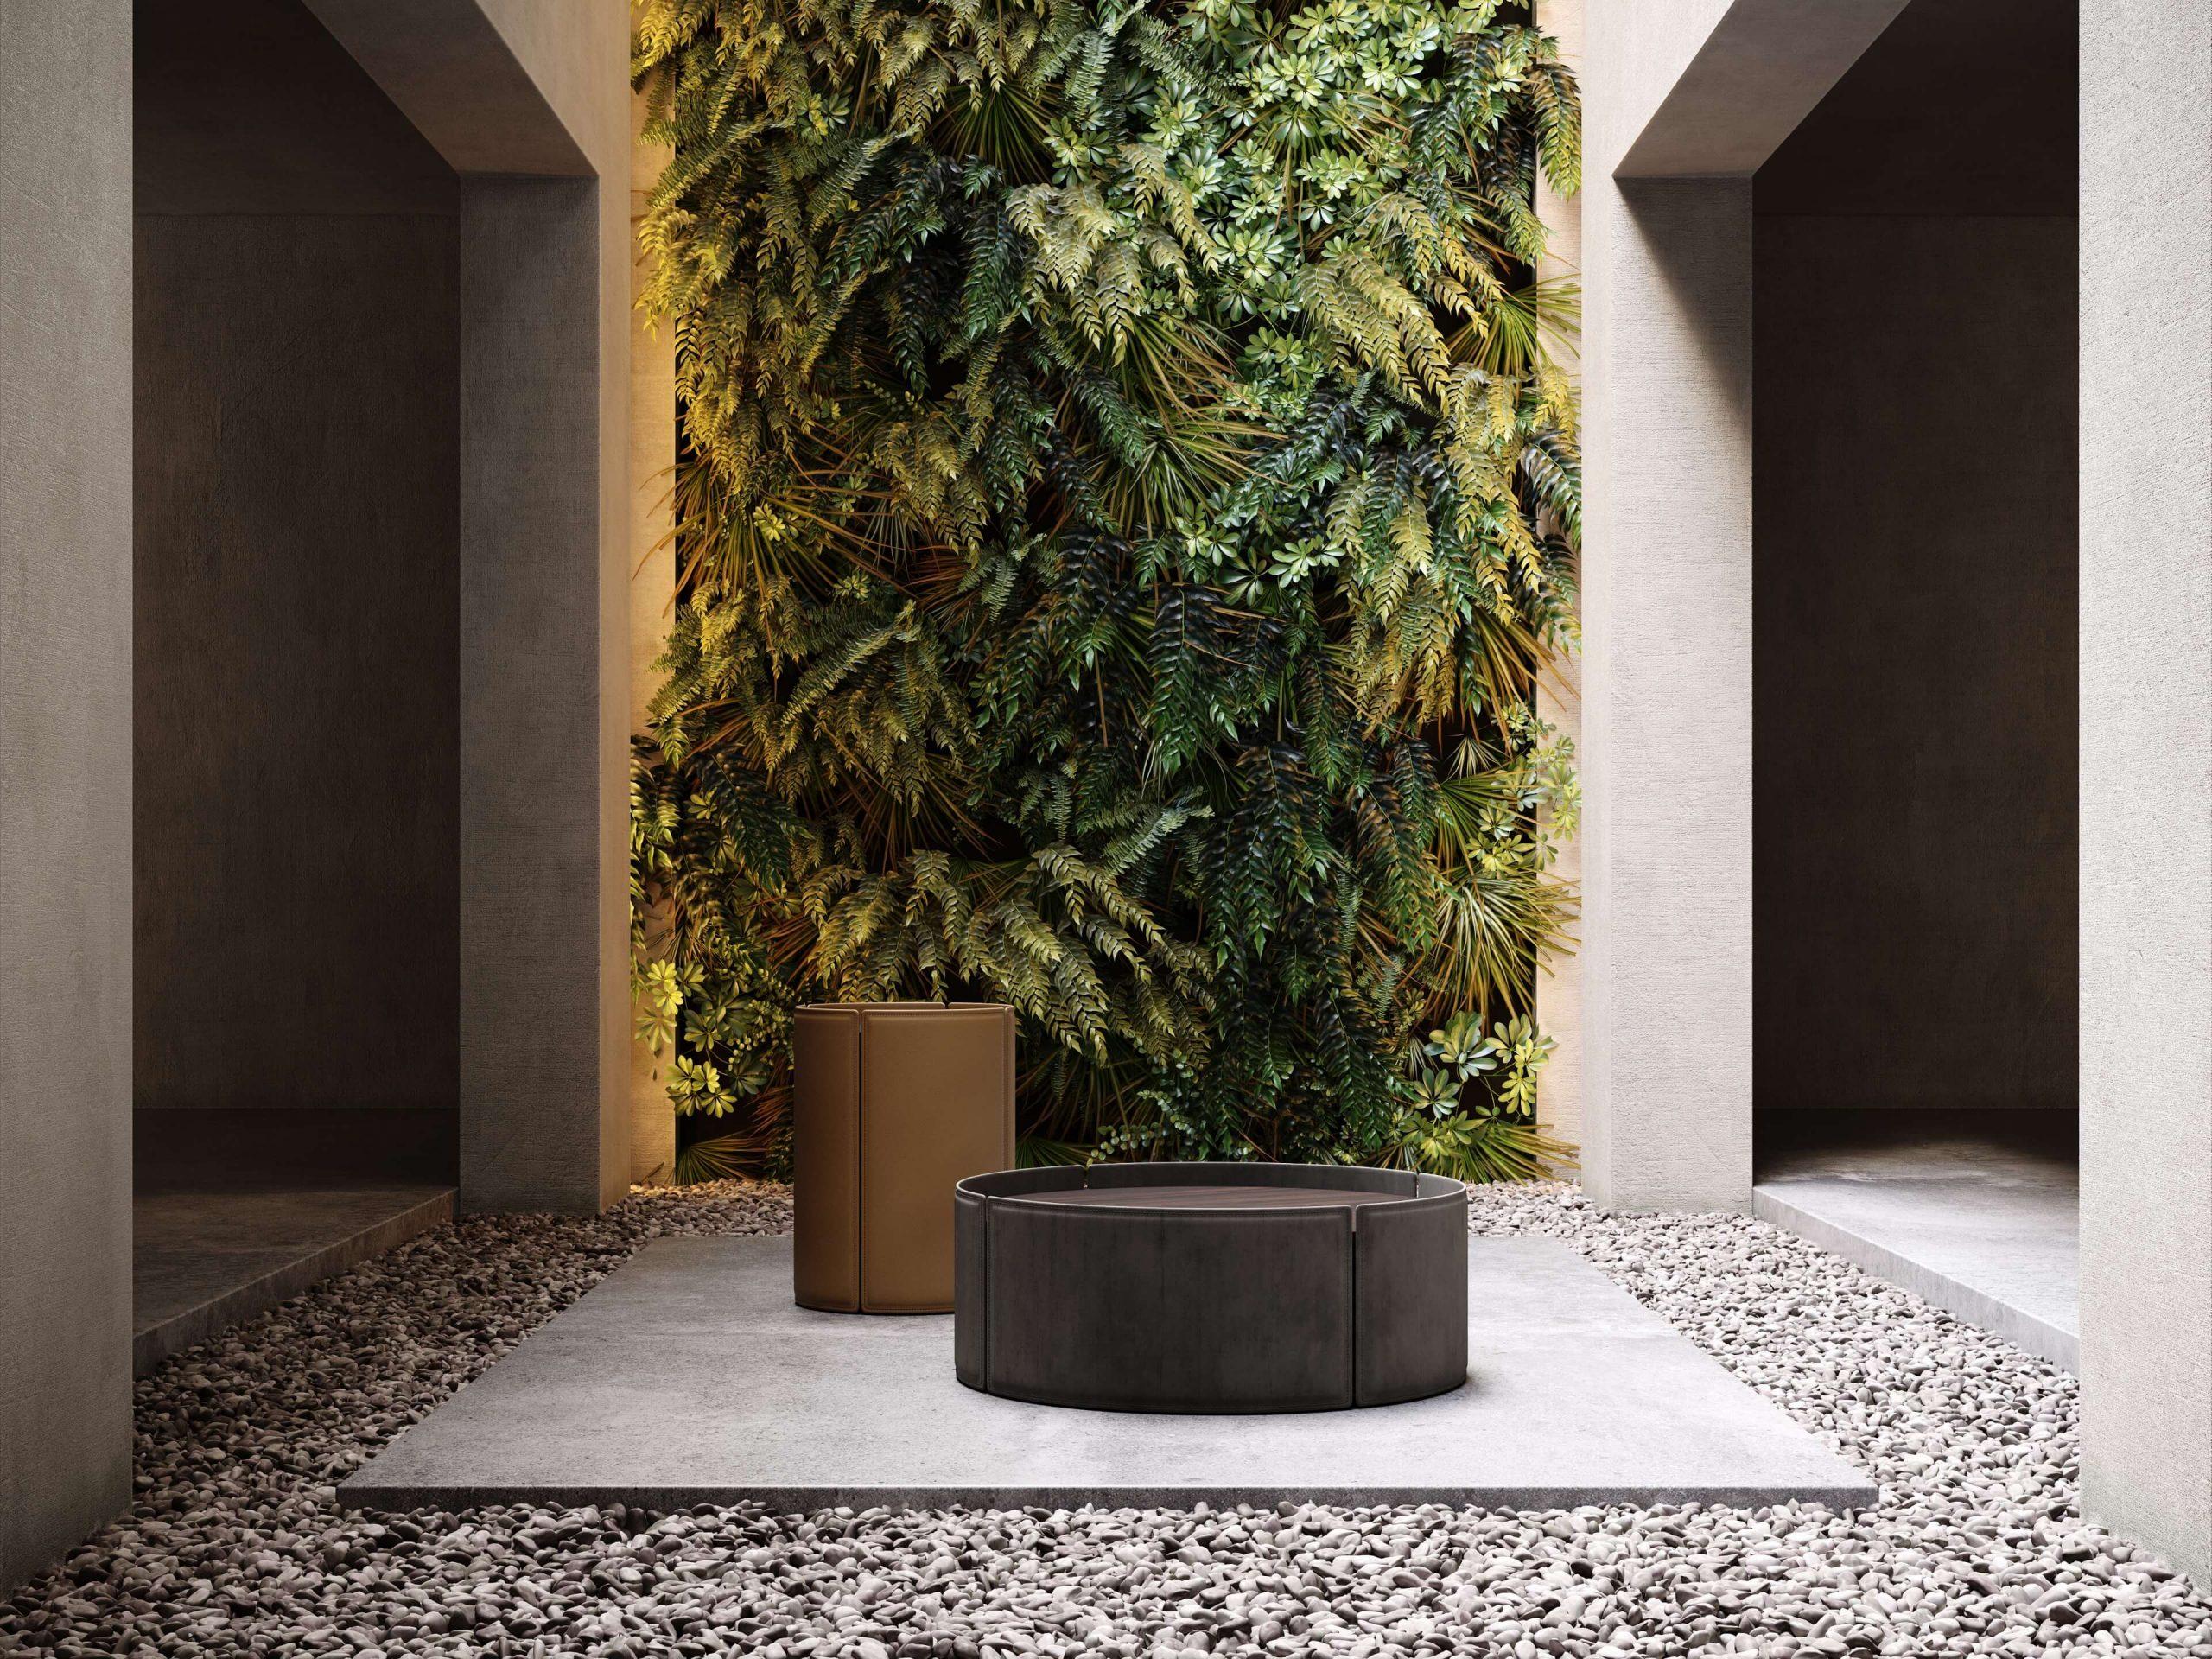 mano-coffee-table-velvet-wood-top-home-decor-domkapa